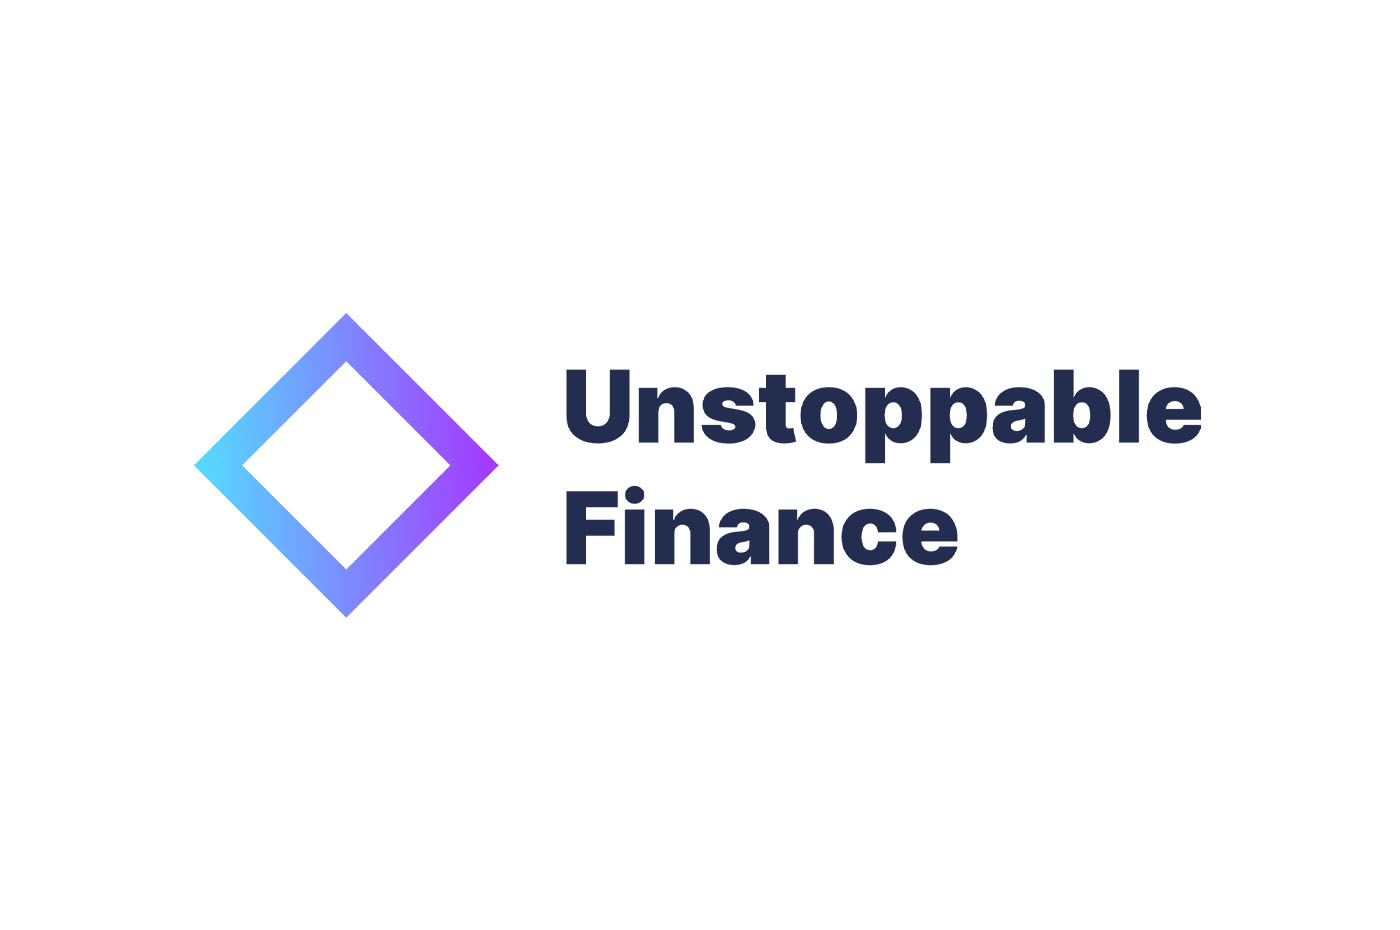 Unstoppable Finance